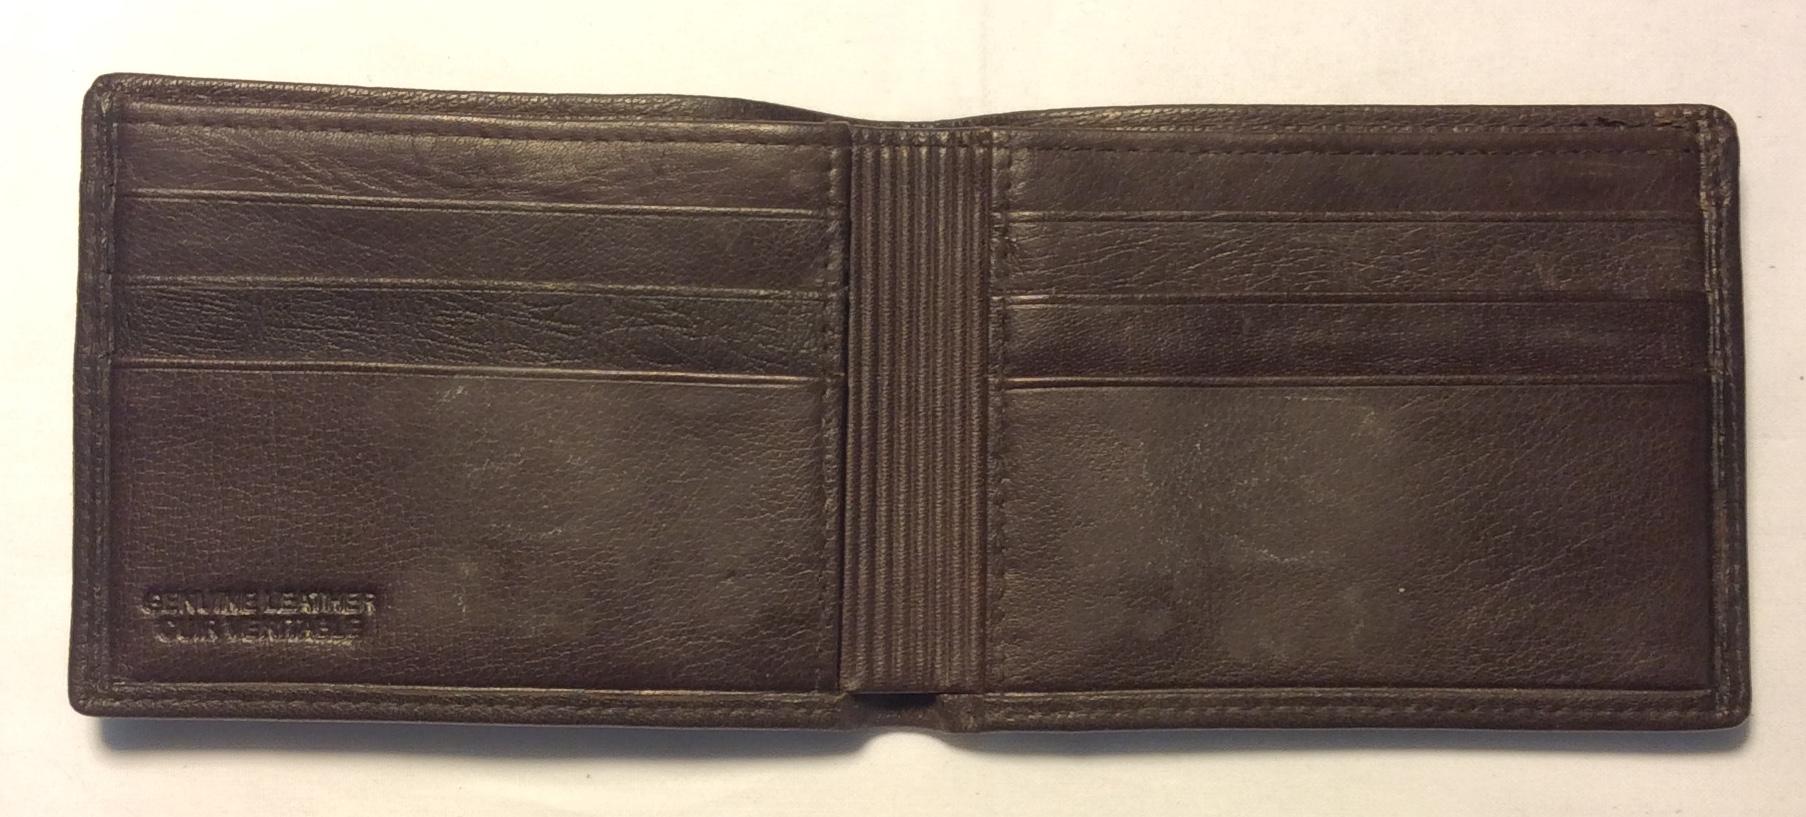 Dark brown leather;ribbed dark brown